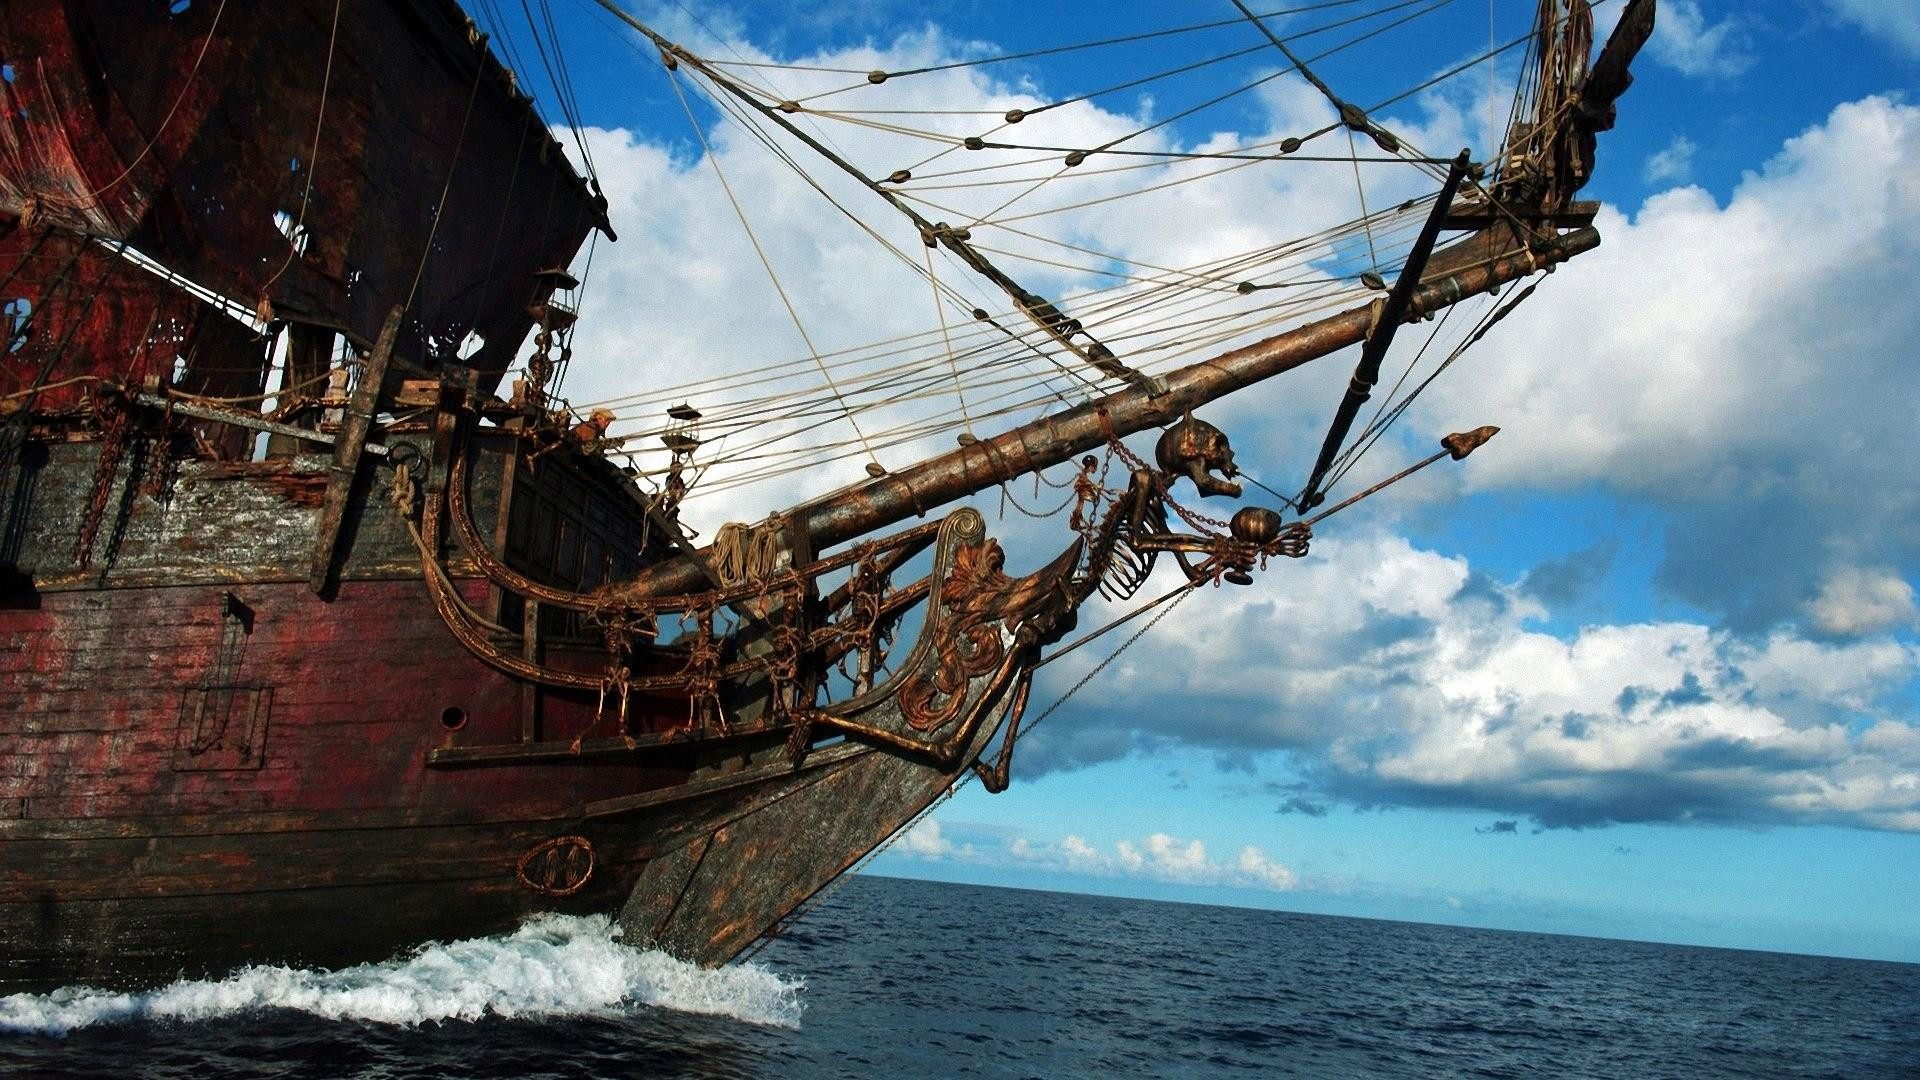 Pirates Of The Caribbean On Stranger Tides Ship wallpaper – 457040